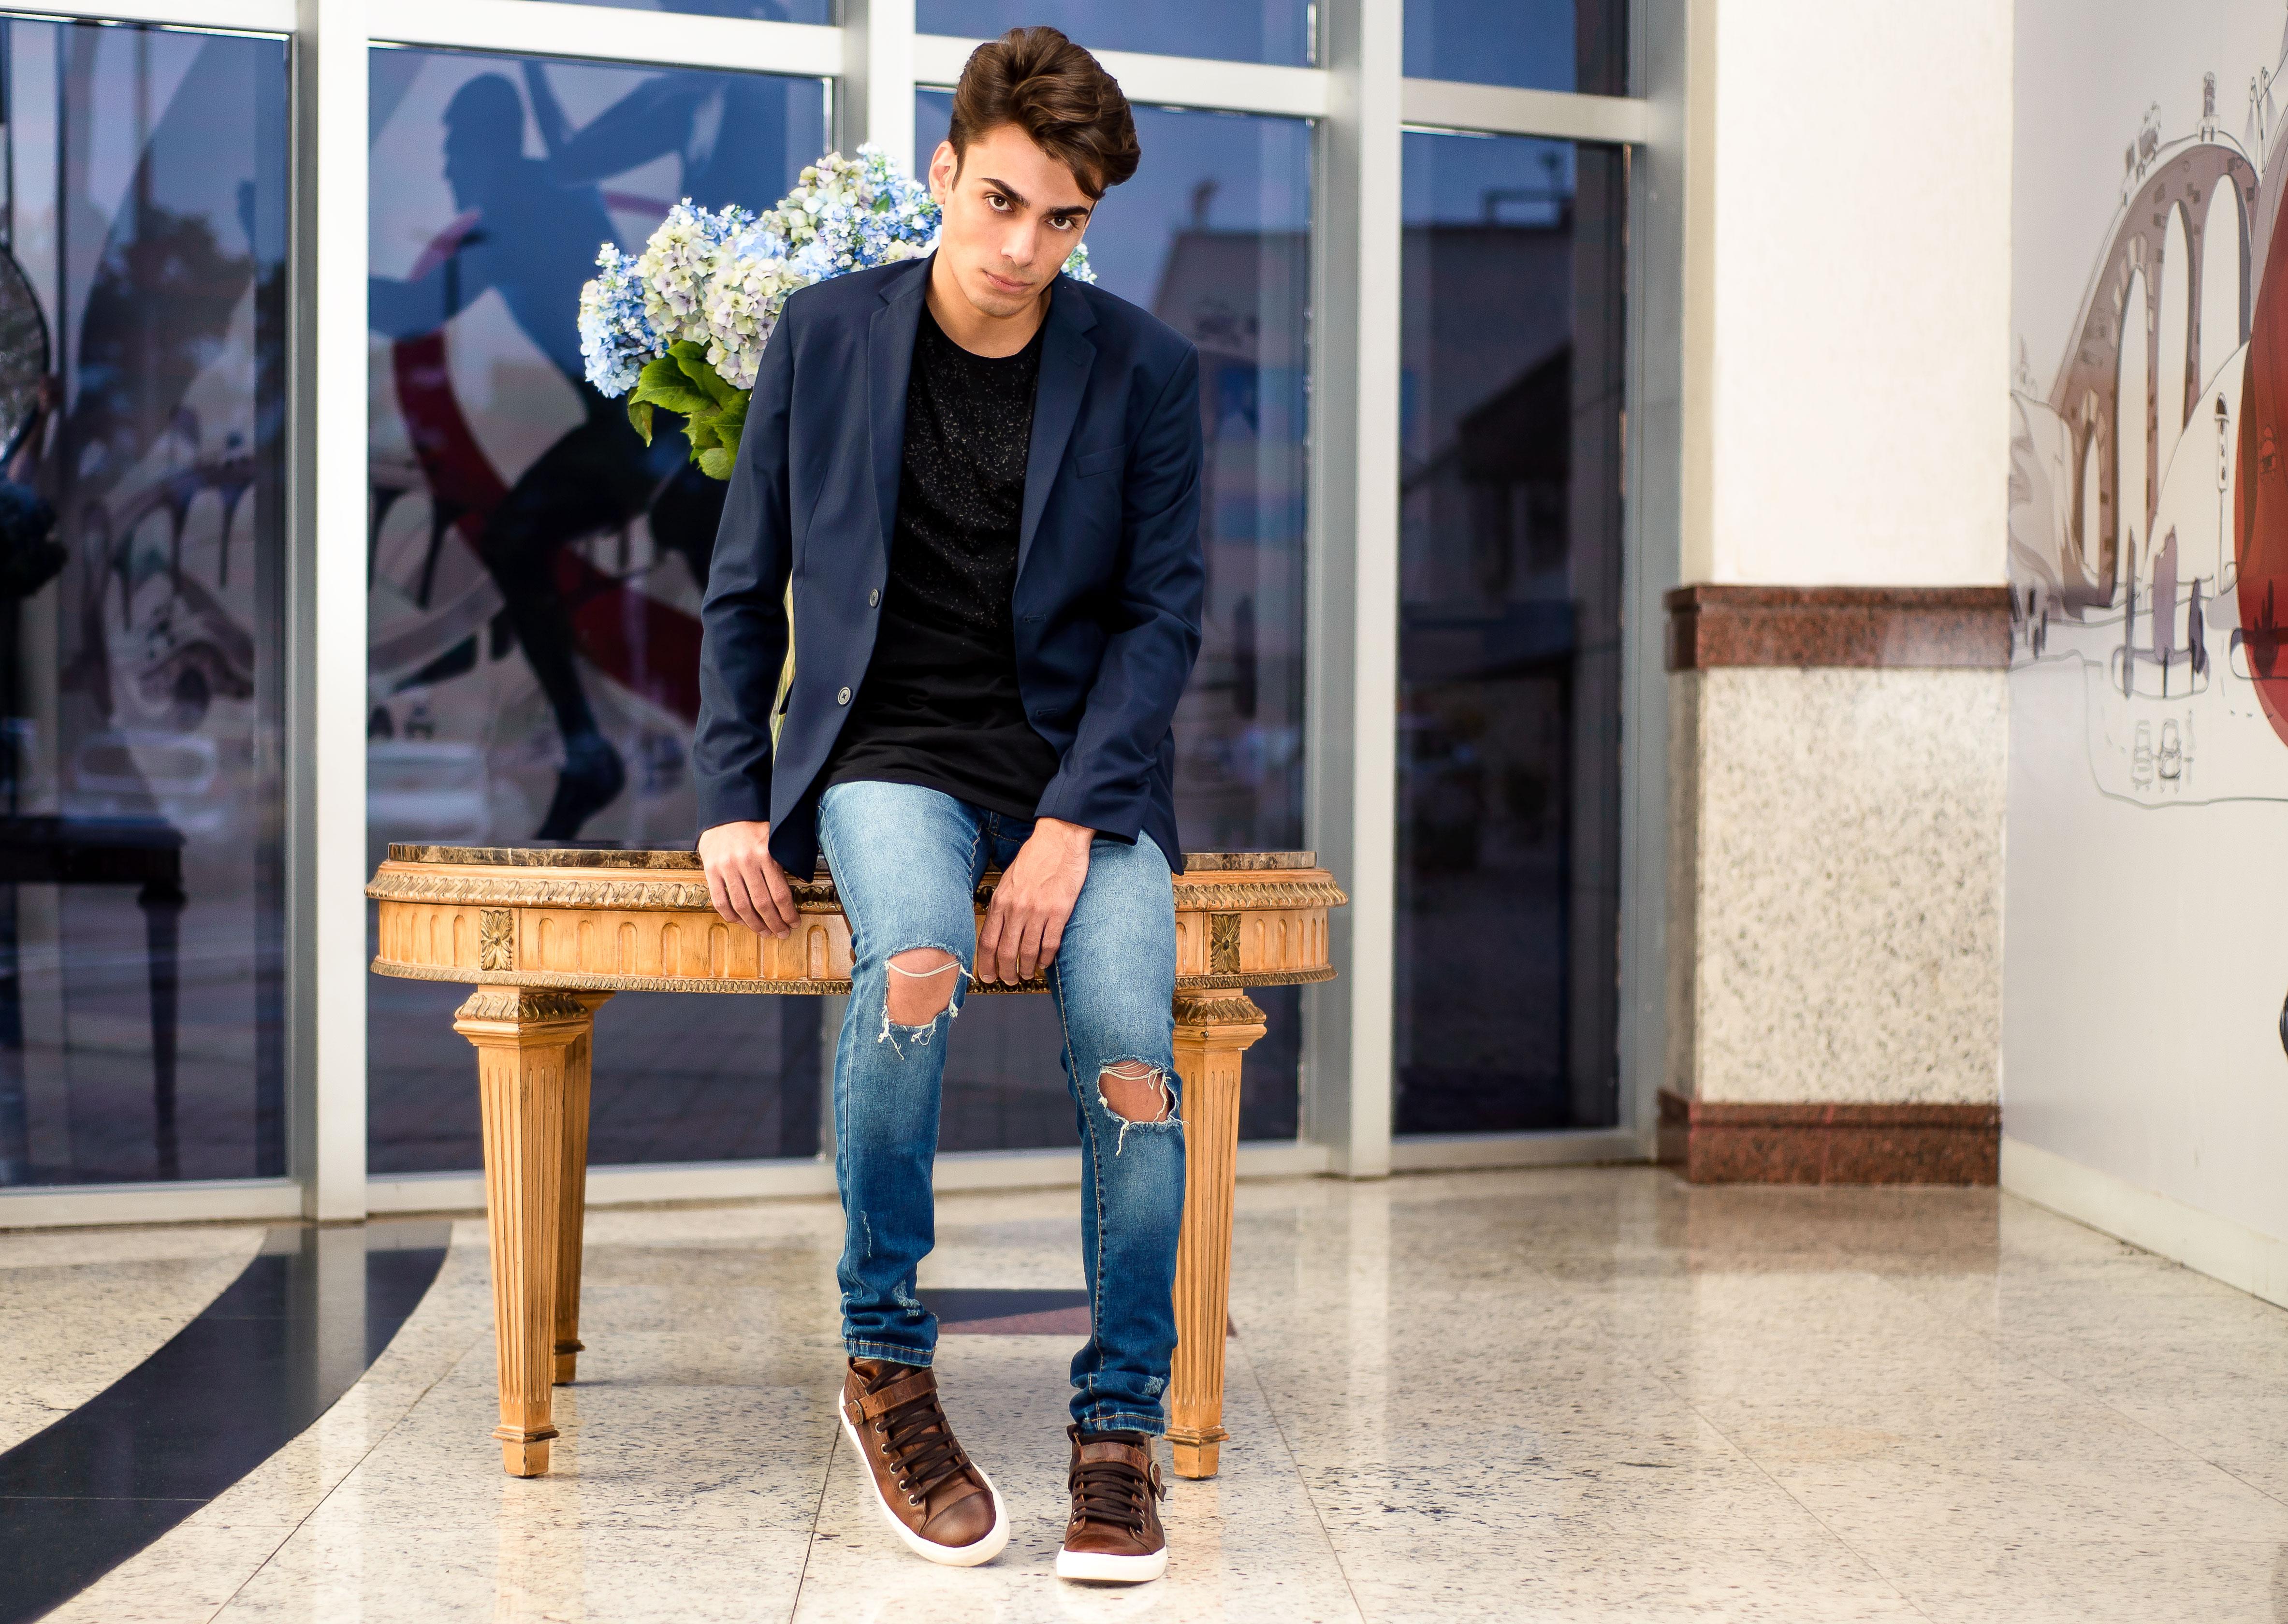 alex cursino, clooset, camila coelho, f hits, patricia abravanel, menswear, blog de moda, blogger, fashion blogger, mens, dicas de moda, roupa masculina, (4)